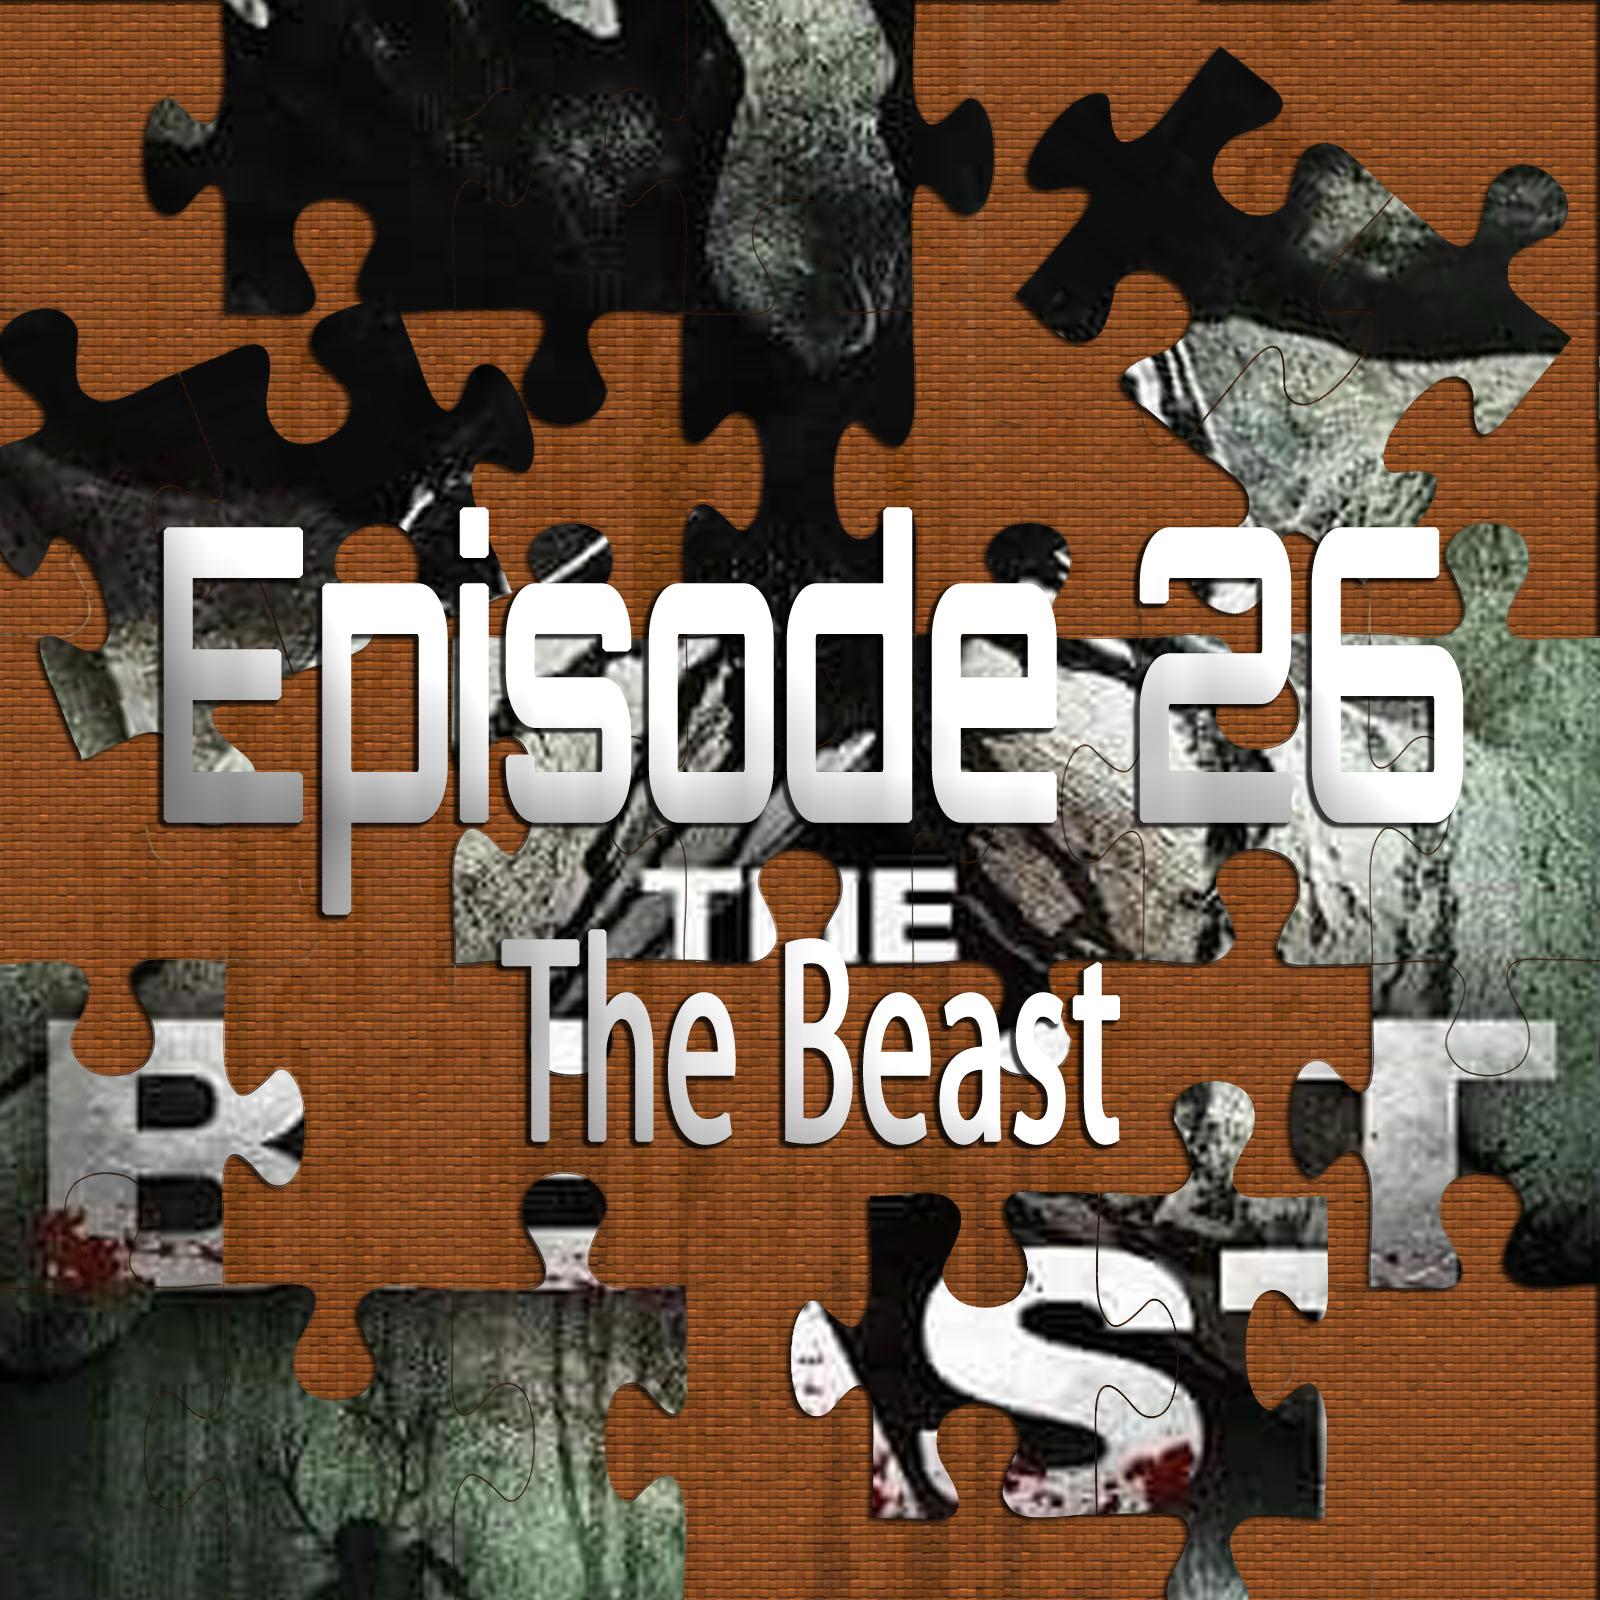 The Beast (Featuring Josh Bell)